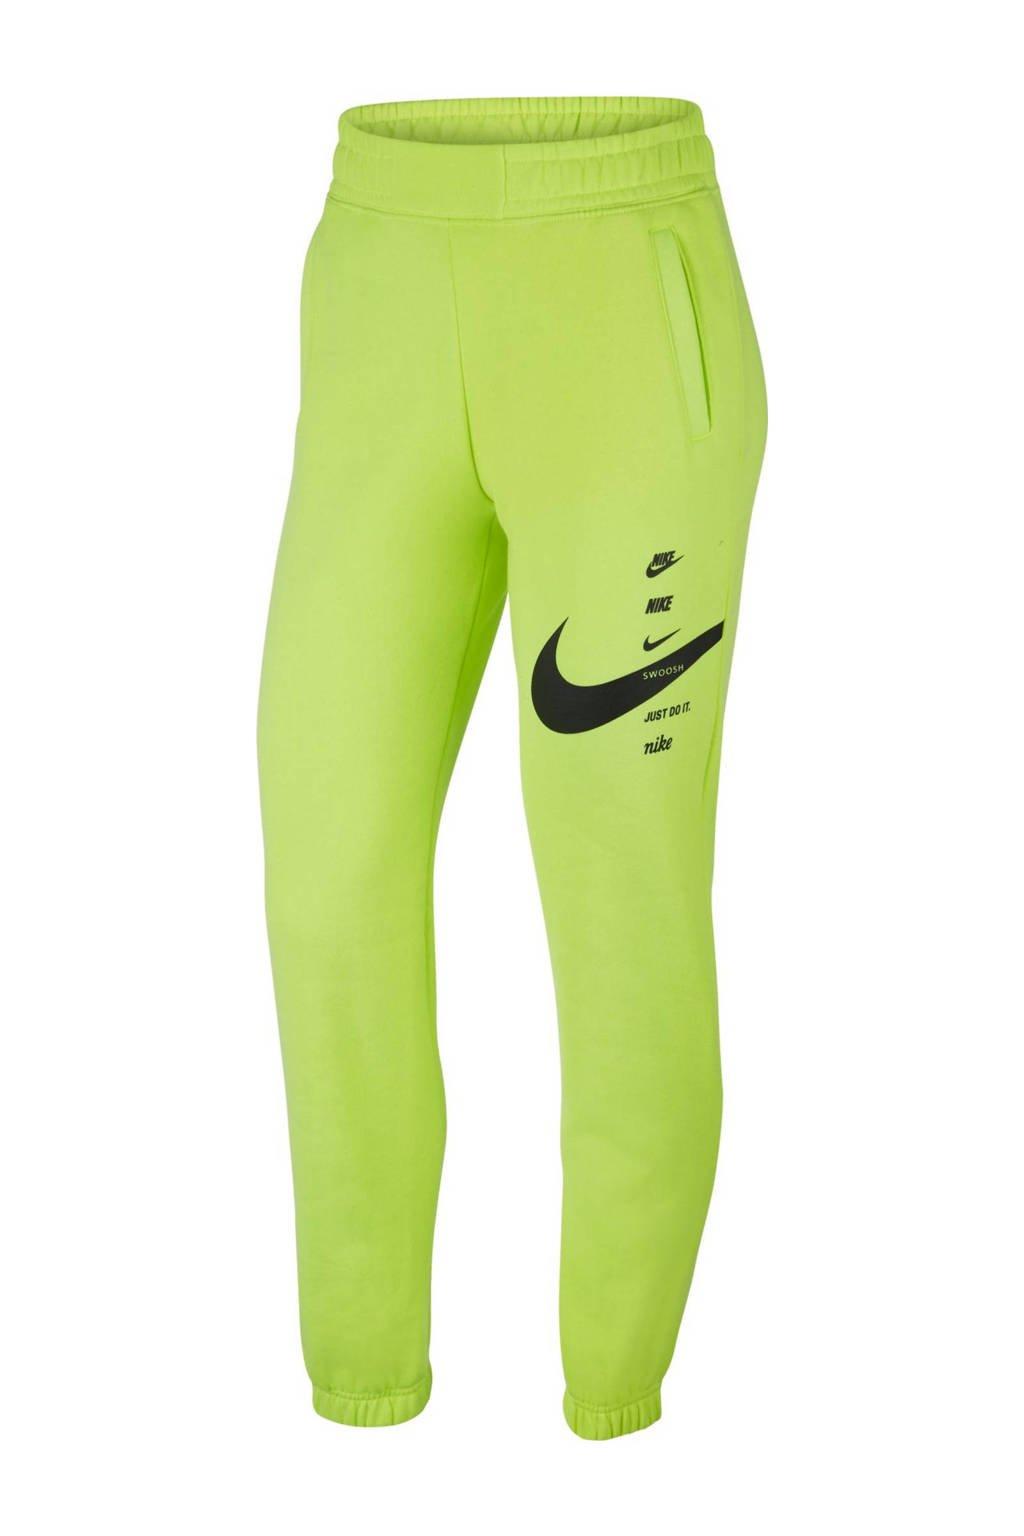 Nike trainingsbroek limegroen, Limegroen